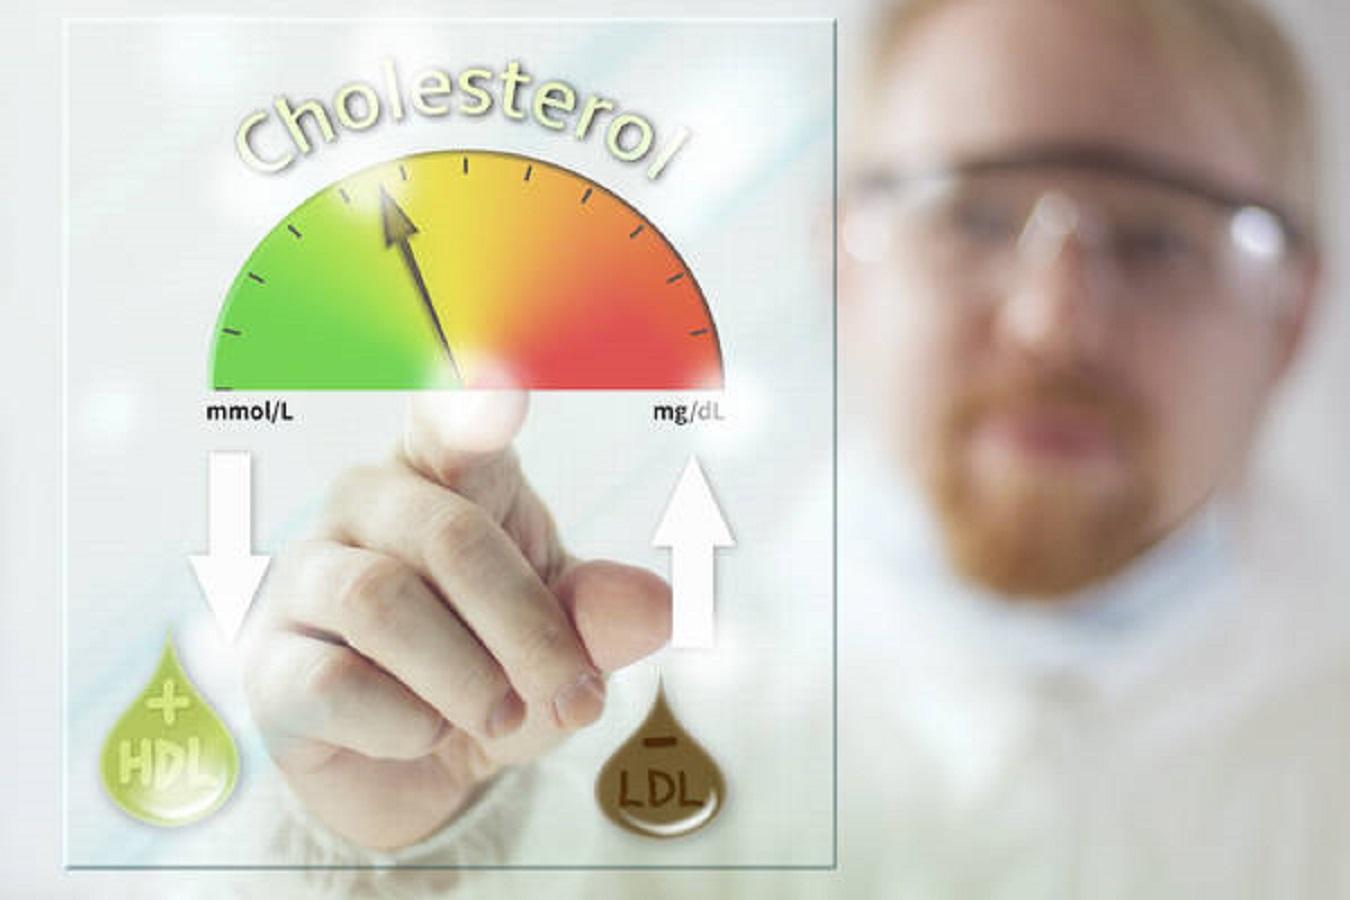 colesterolo-alto-dormire